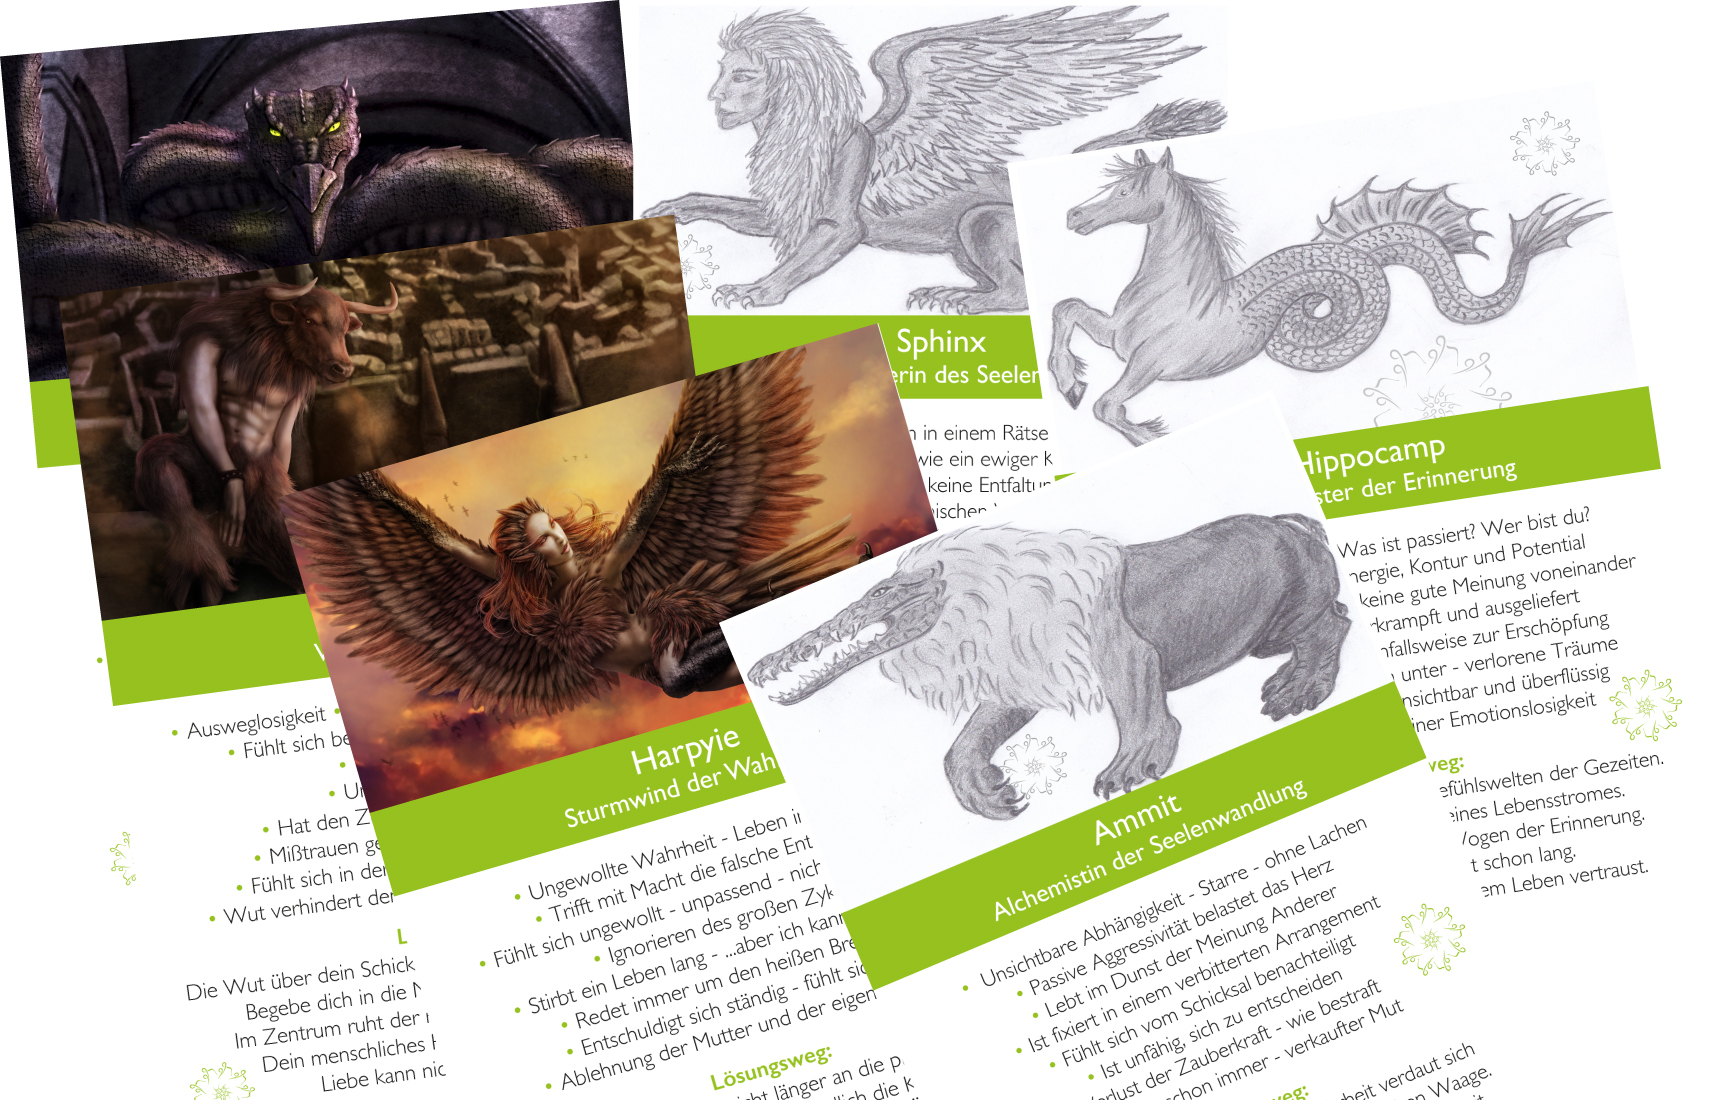 Mythologische Wesen-web-1